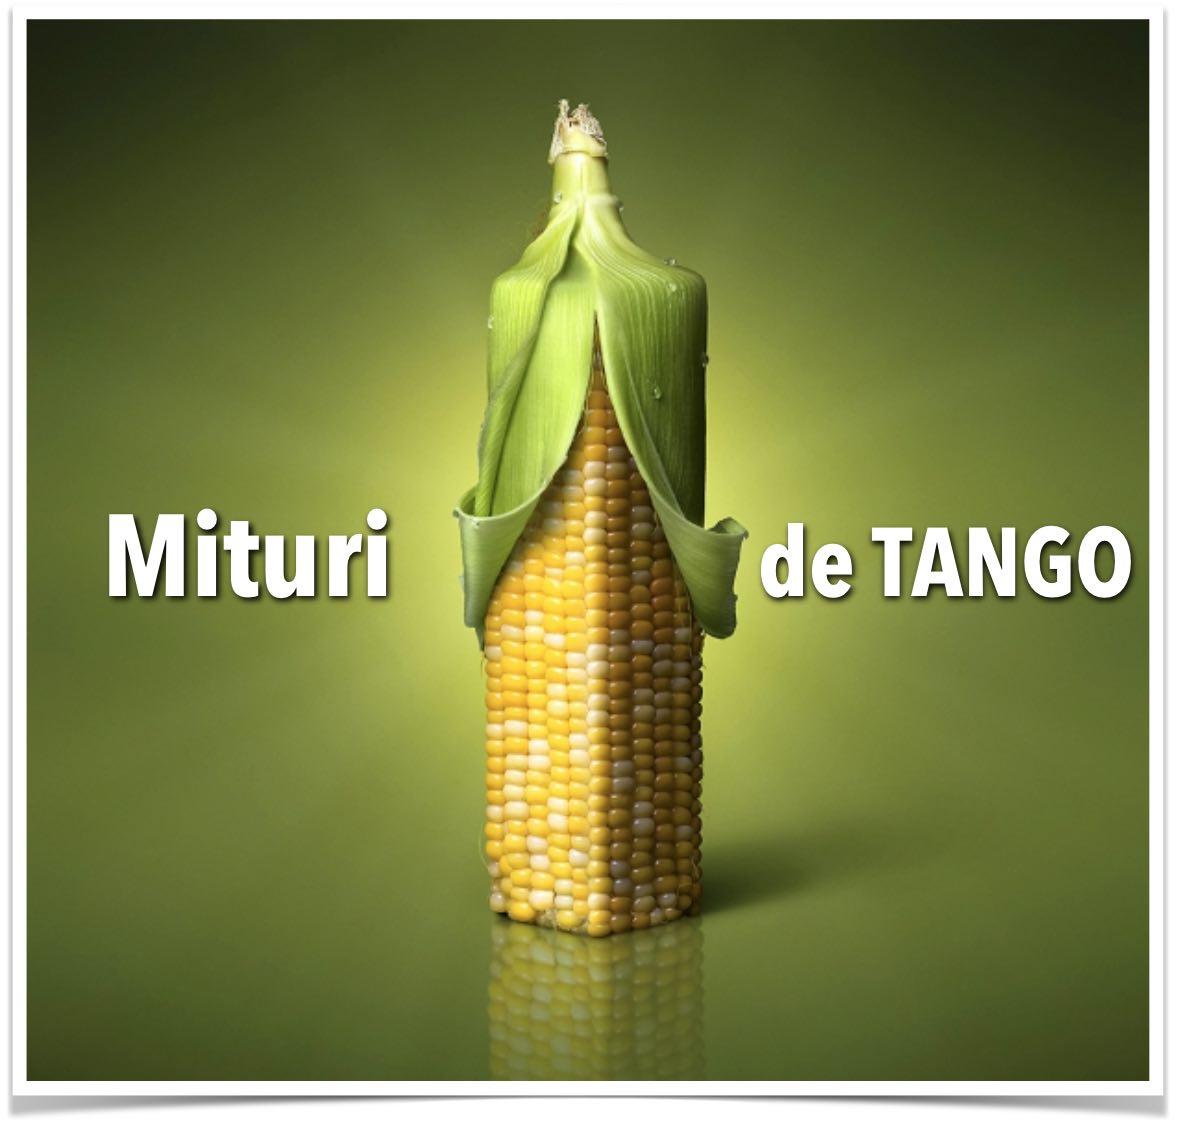 intrebari-mituri-tango-tangent